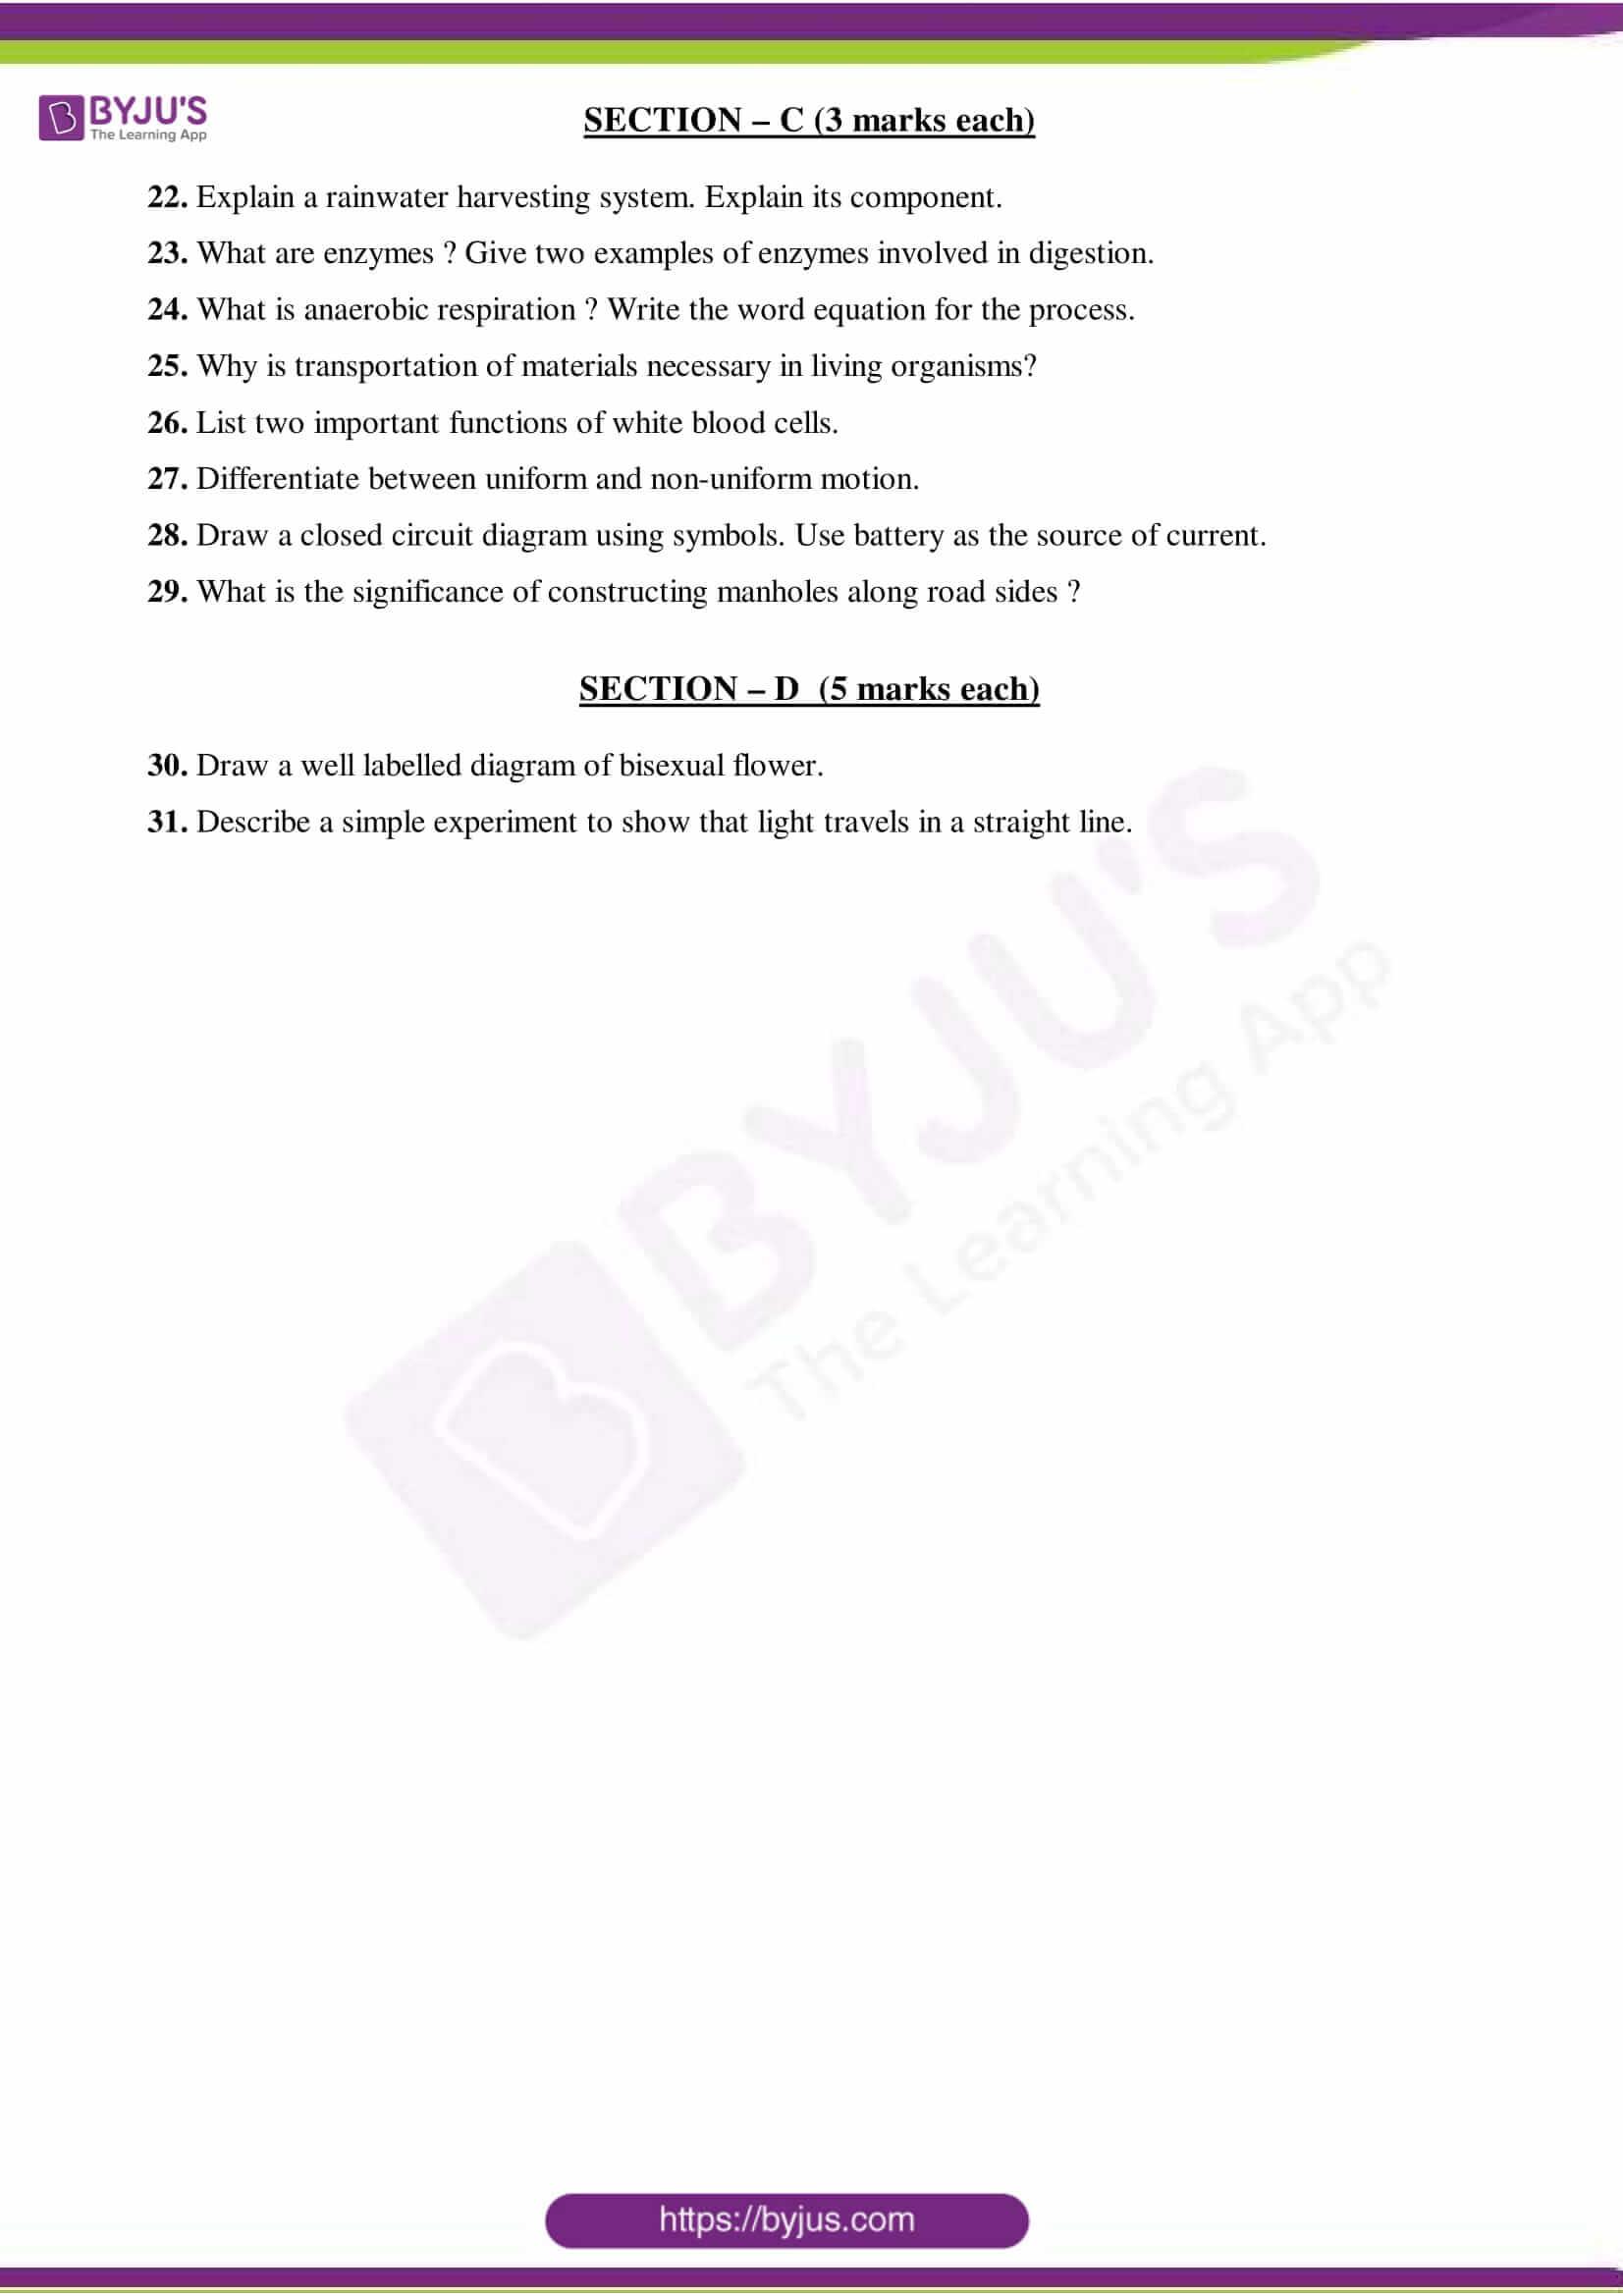 cbse sample paper class 7 science set 6